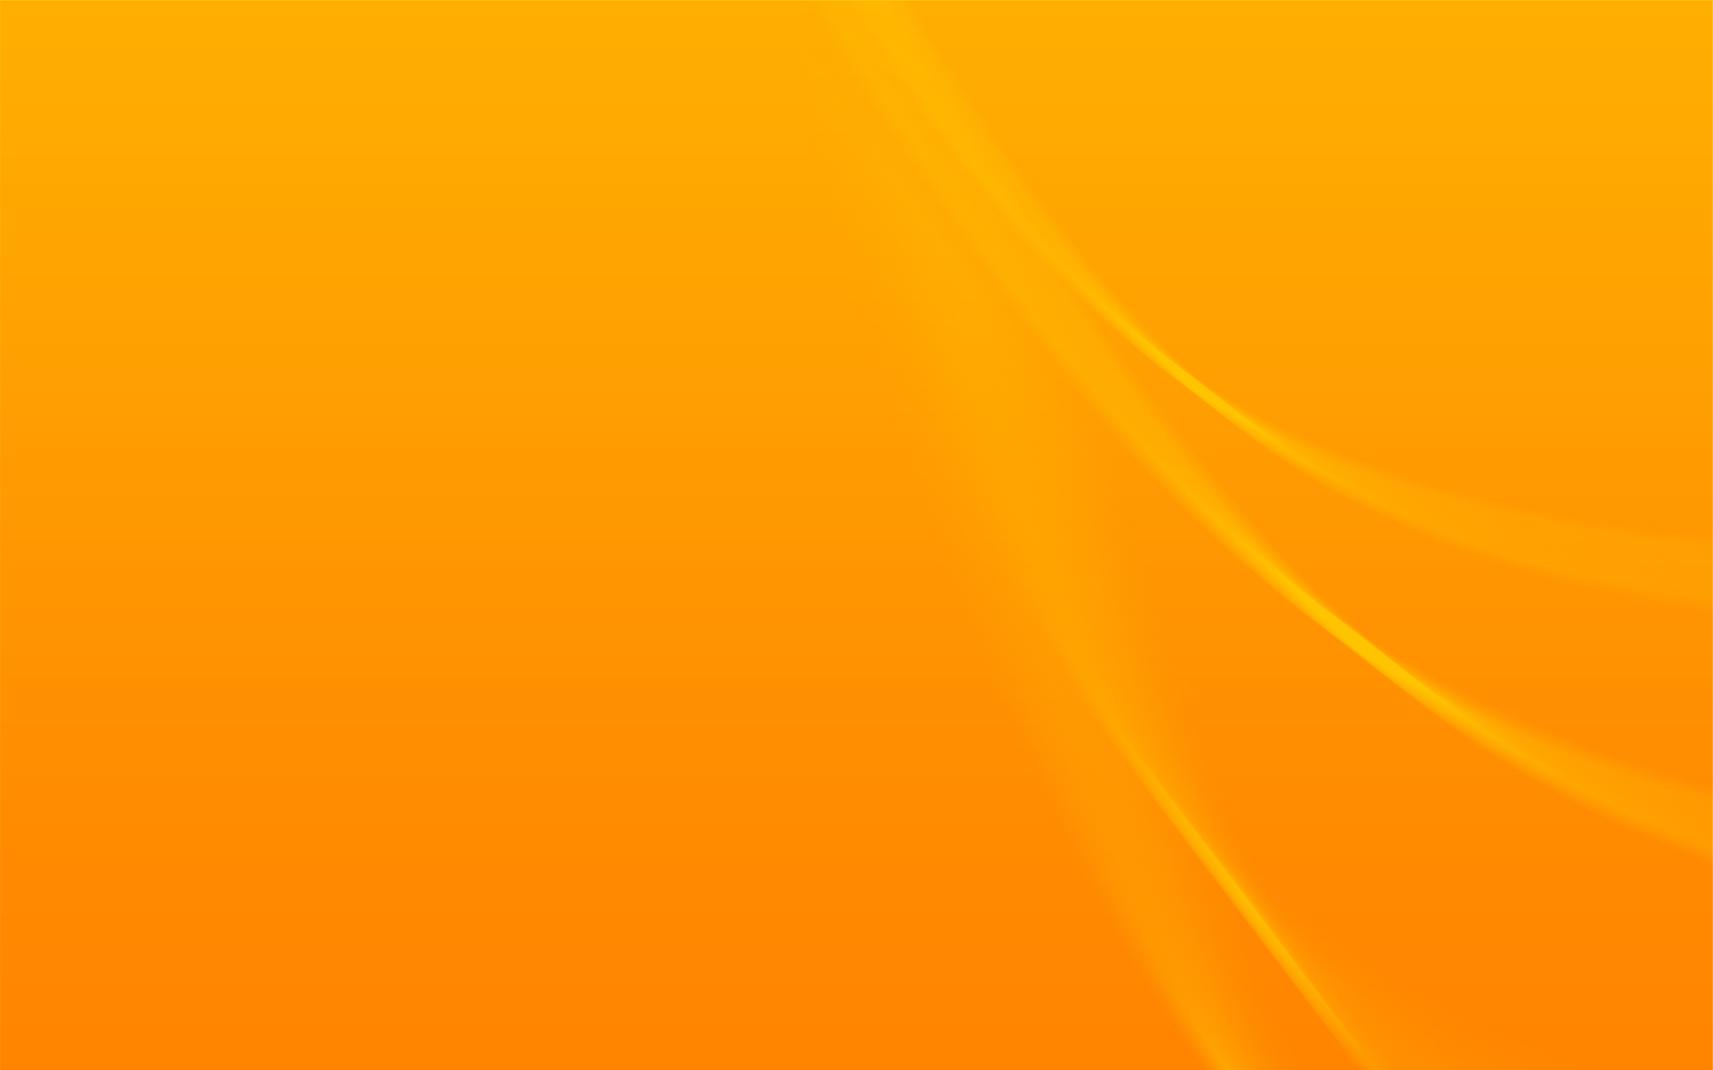 Cool Orange Backgrounds Cool Orange Color 1713x1070